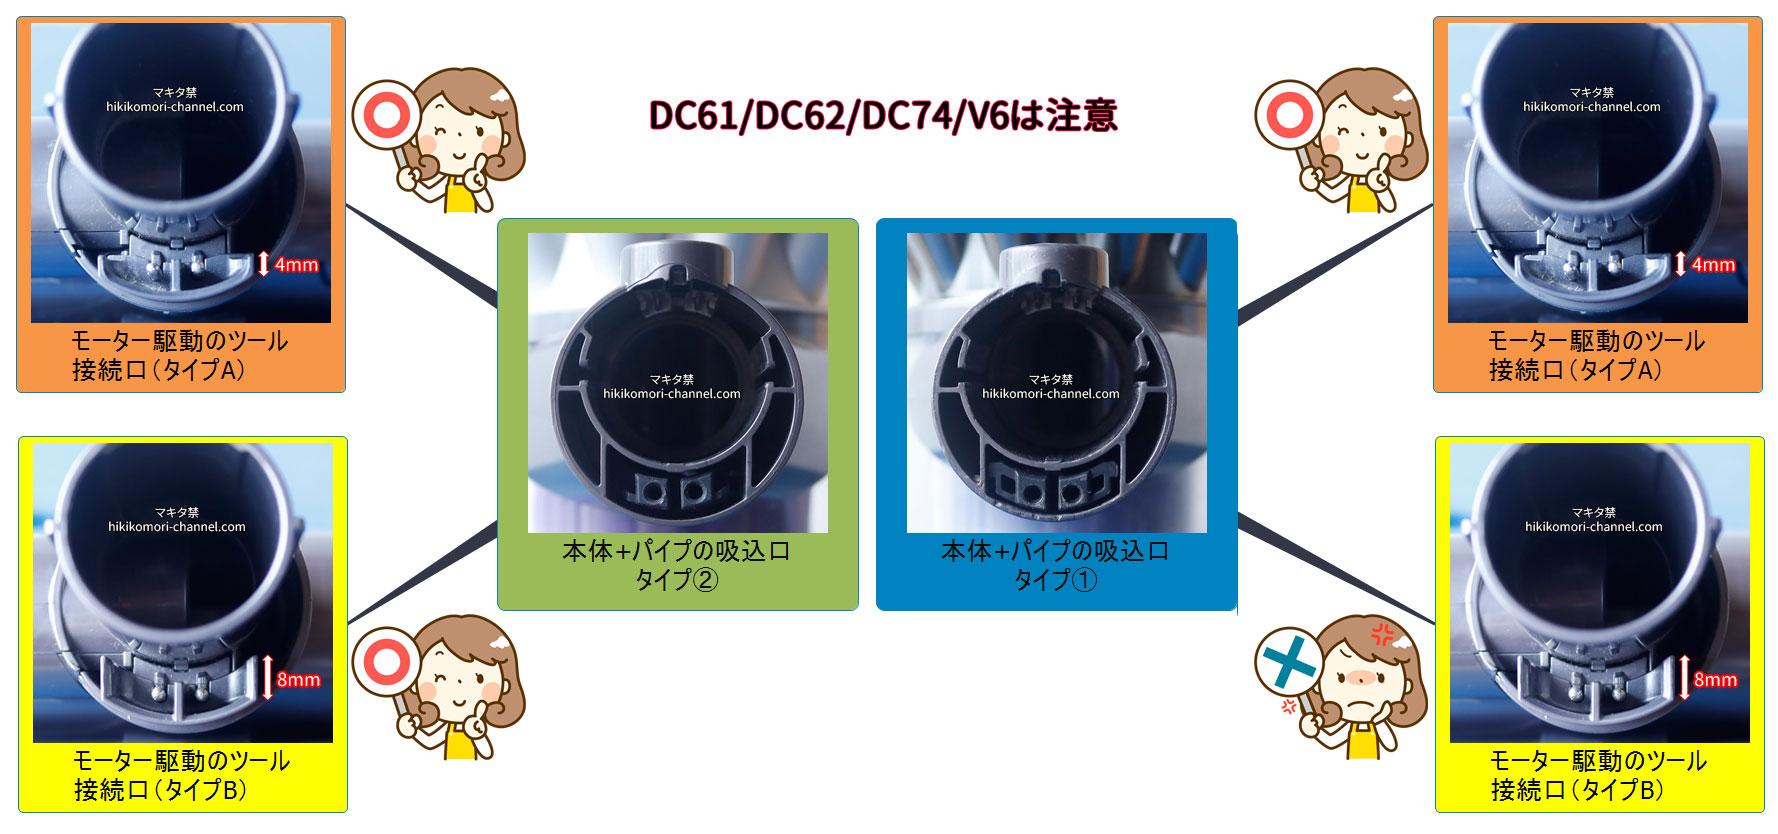 DC61/DC62/DC74/V6(互換性のある接続口)